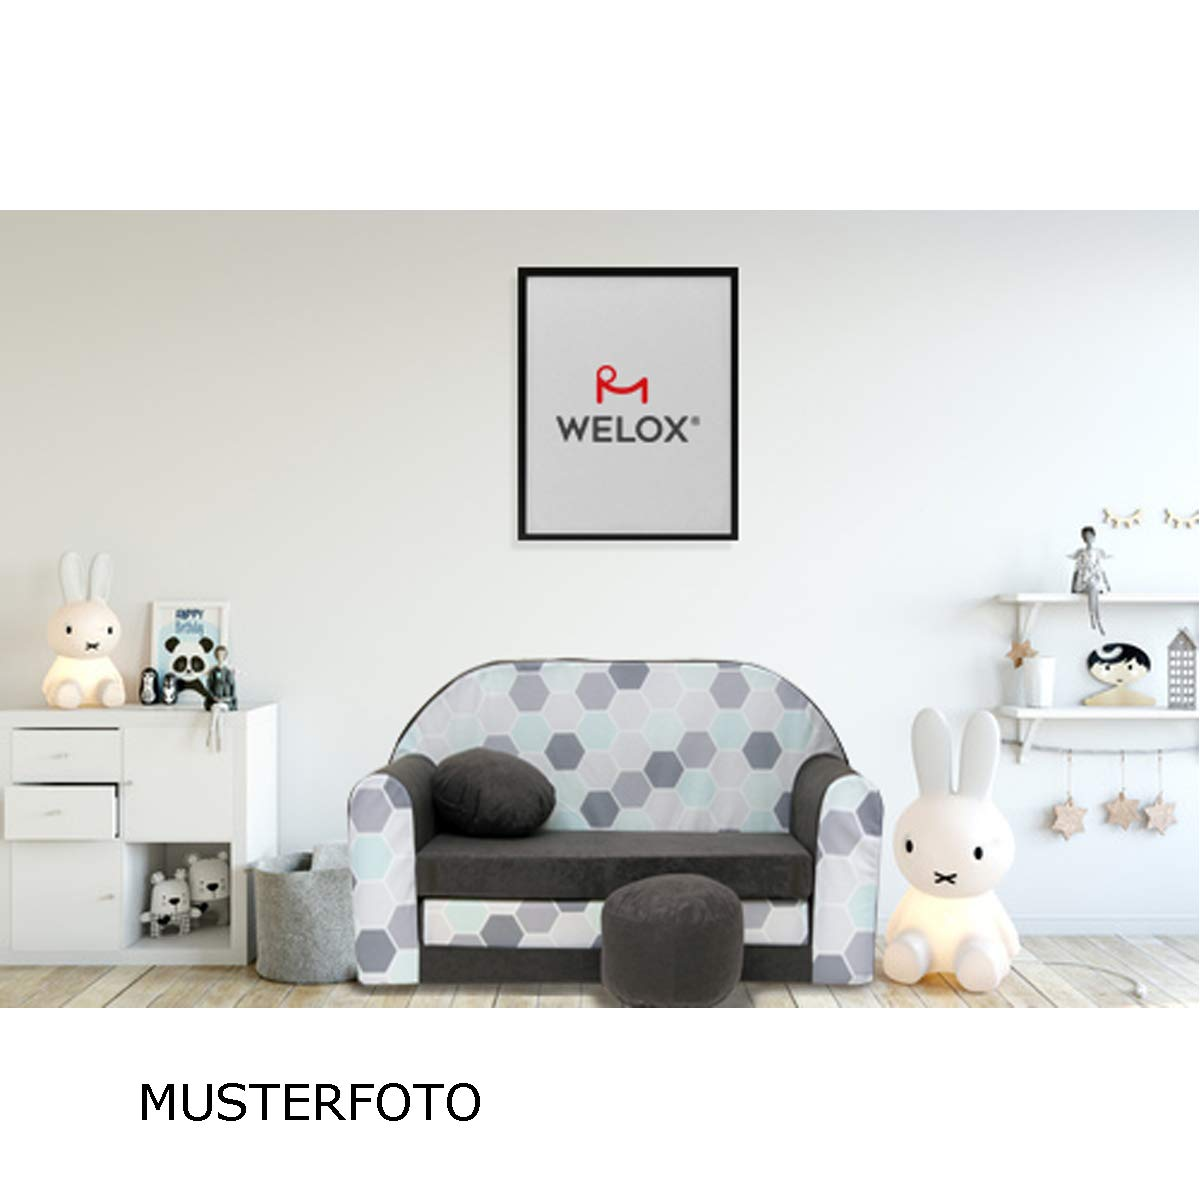 G30 Kindersofa Kinder Sofa Couch Schlafsofa Kinderzimmer Bett gem/ütlich violett Eule